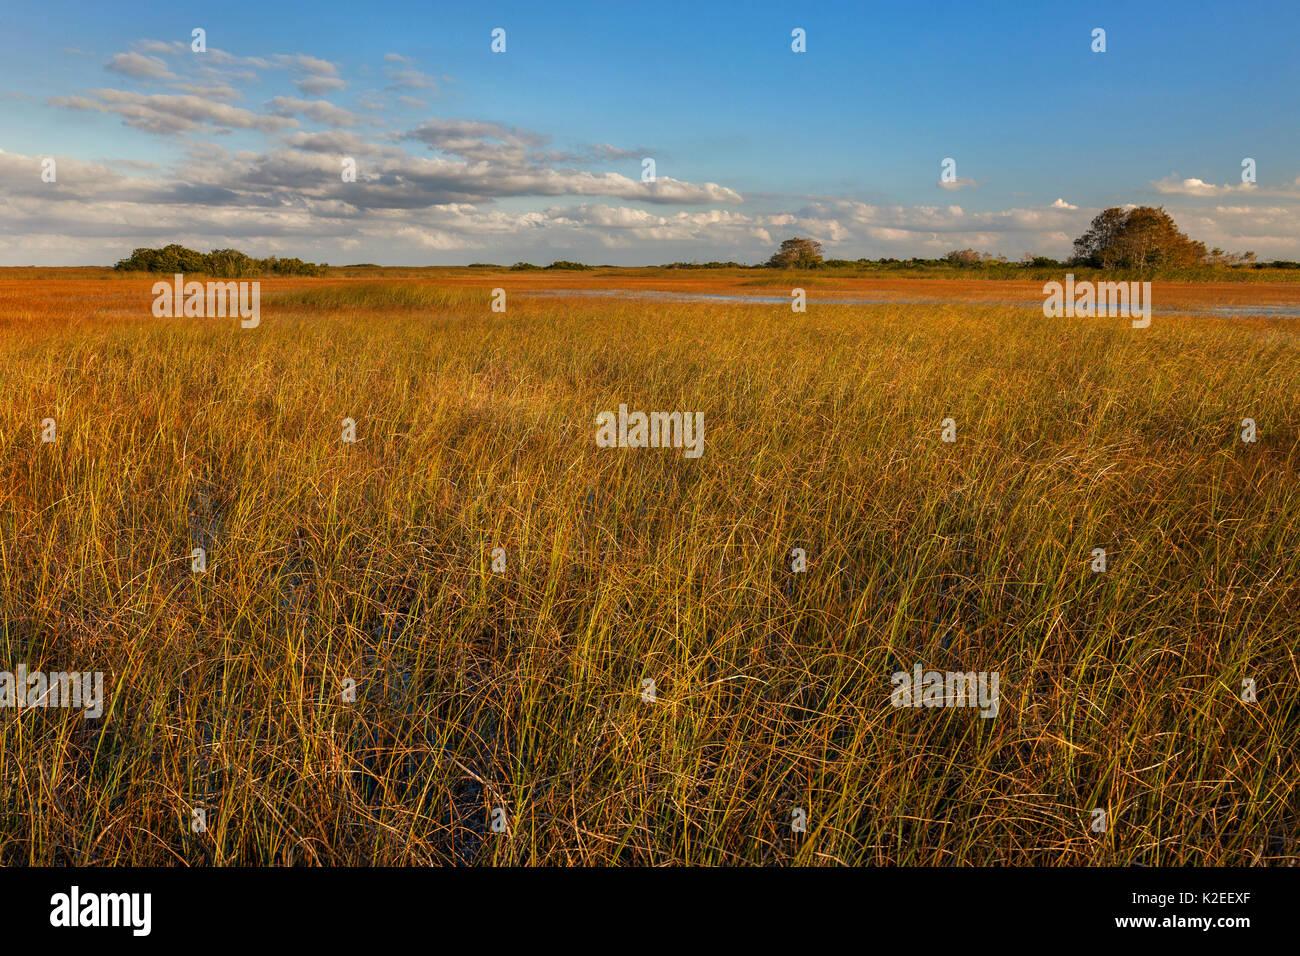 Sawgrass Prairie, Everglades National Park, Florida, USA. January. - Stock Image